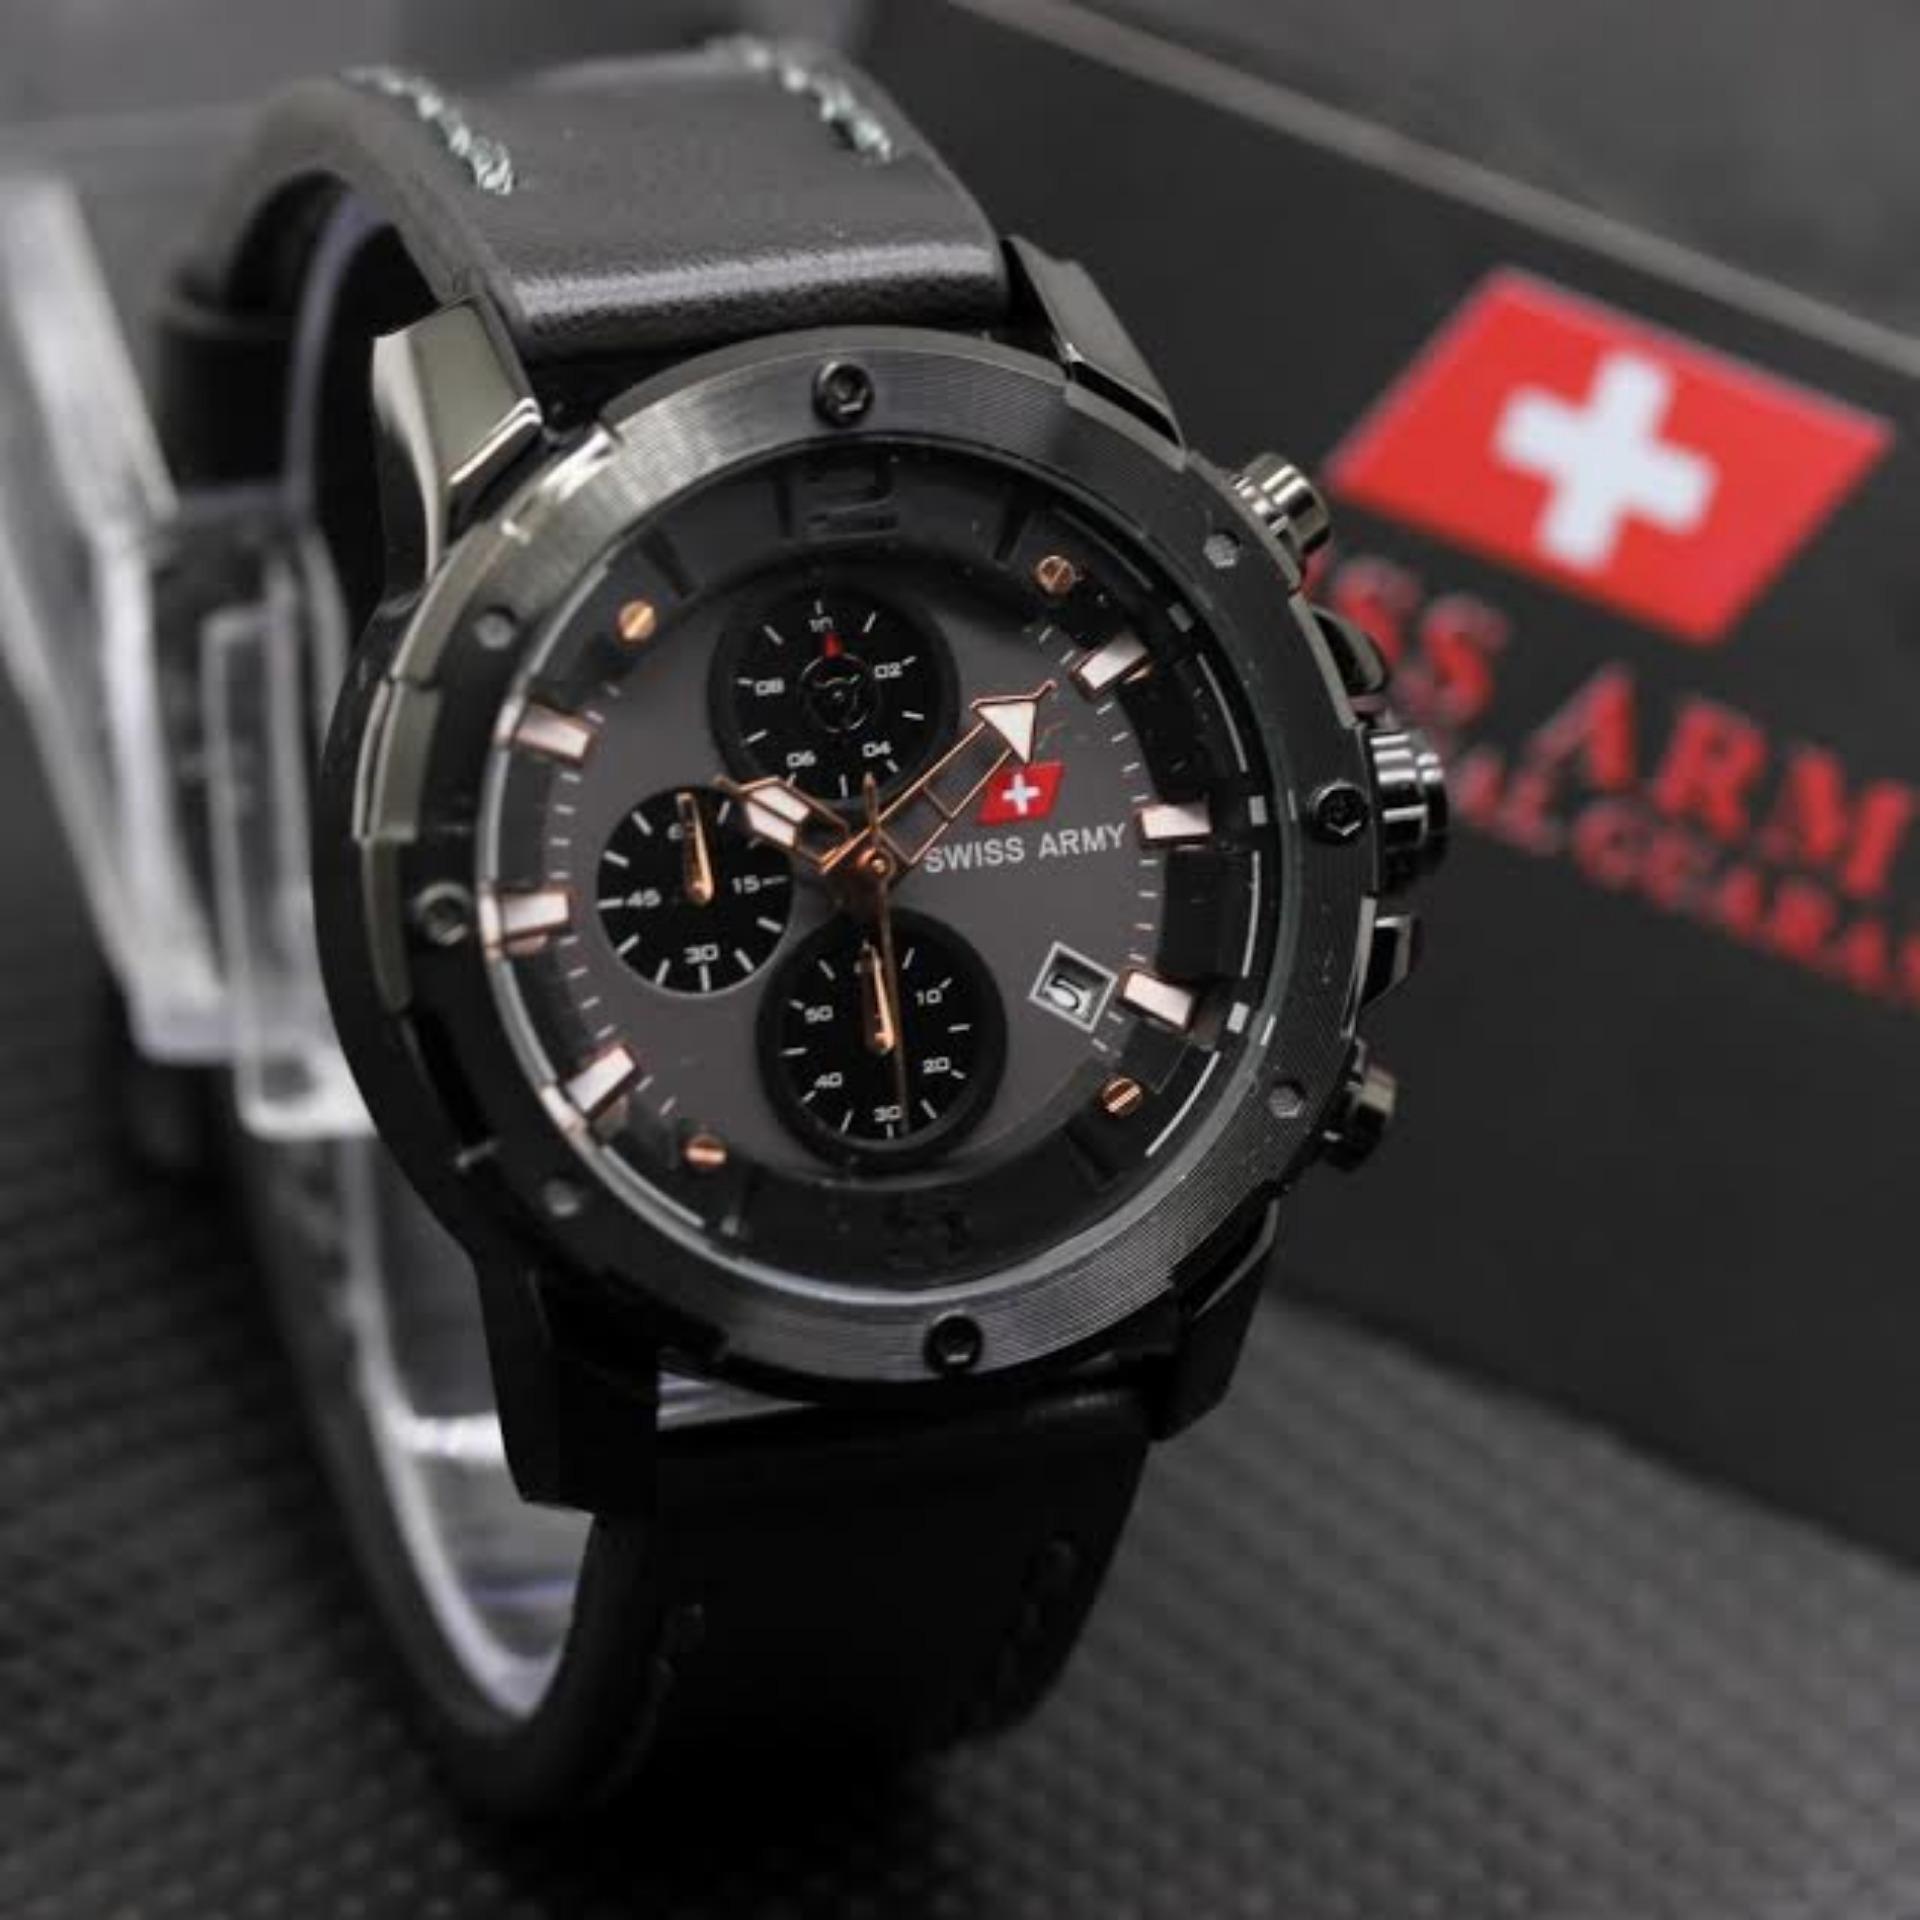 Toko Swiss Army Jam Tangan Pria Leather Strap Chrono Aktif Sa 7329 Lengkap Di Dki Jakarta